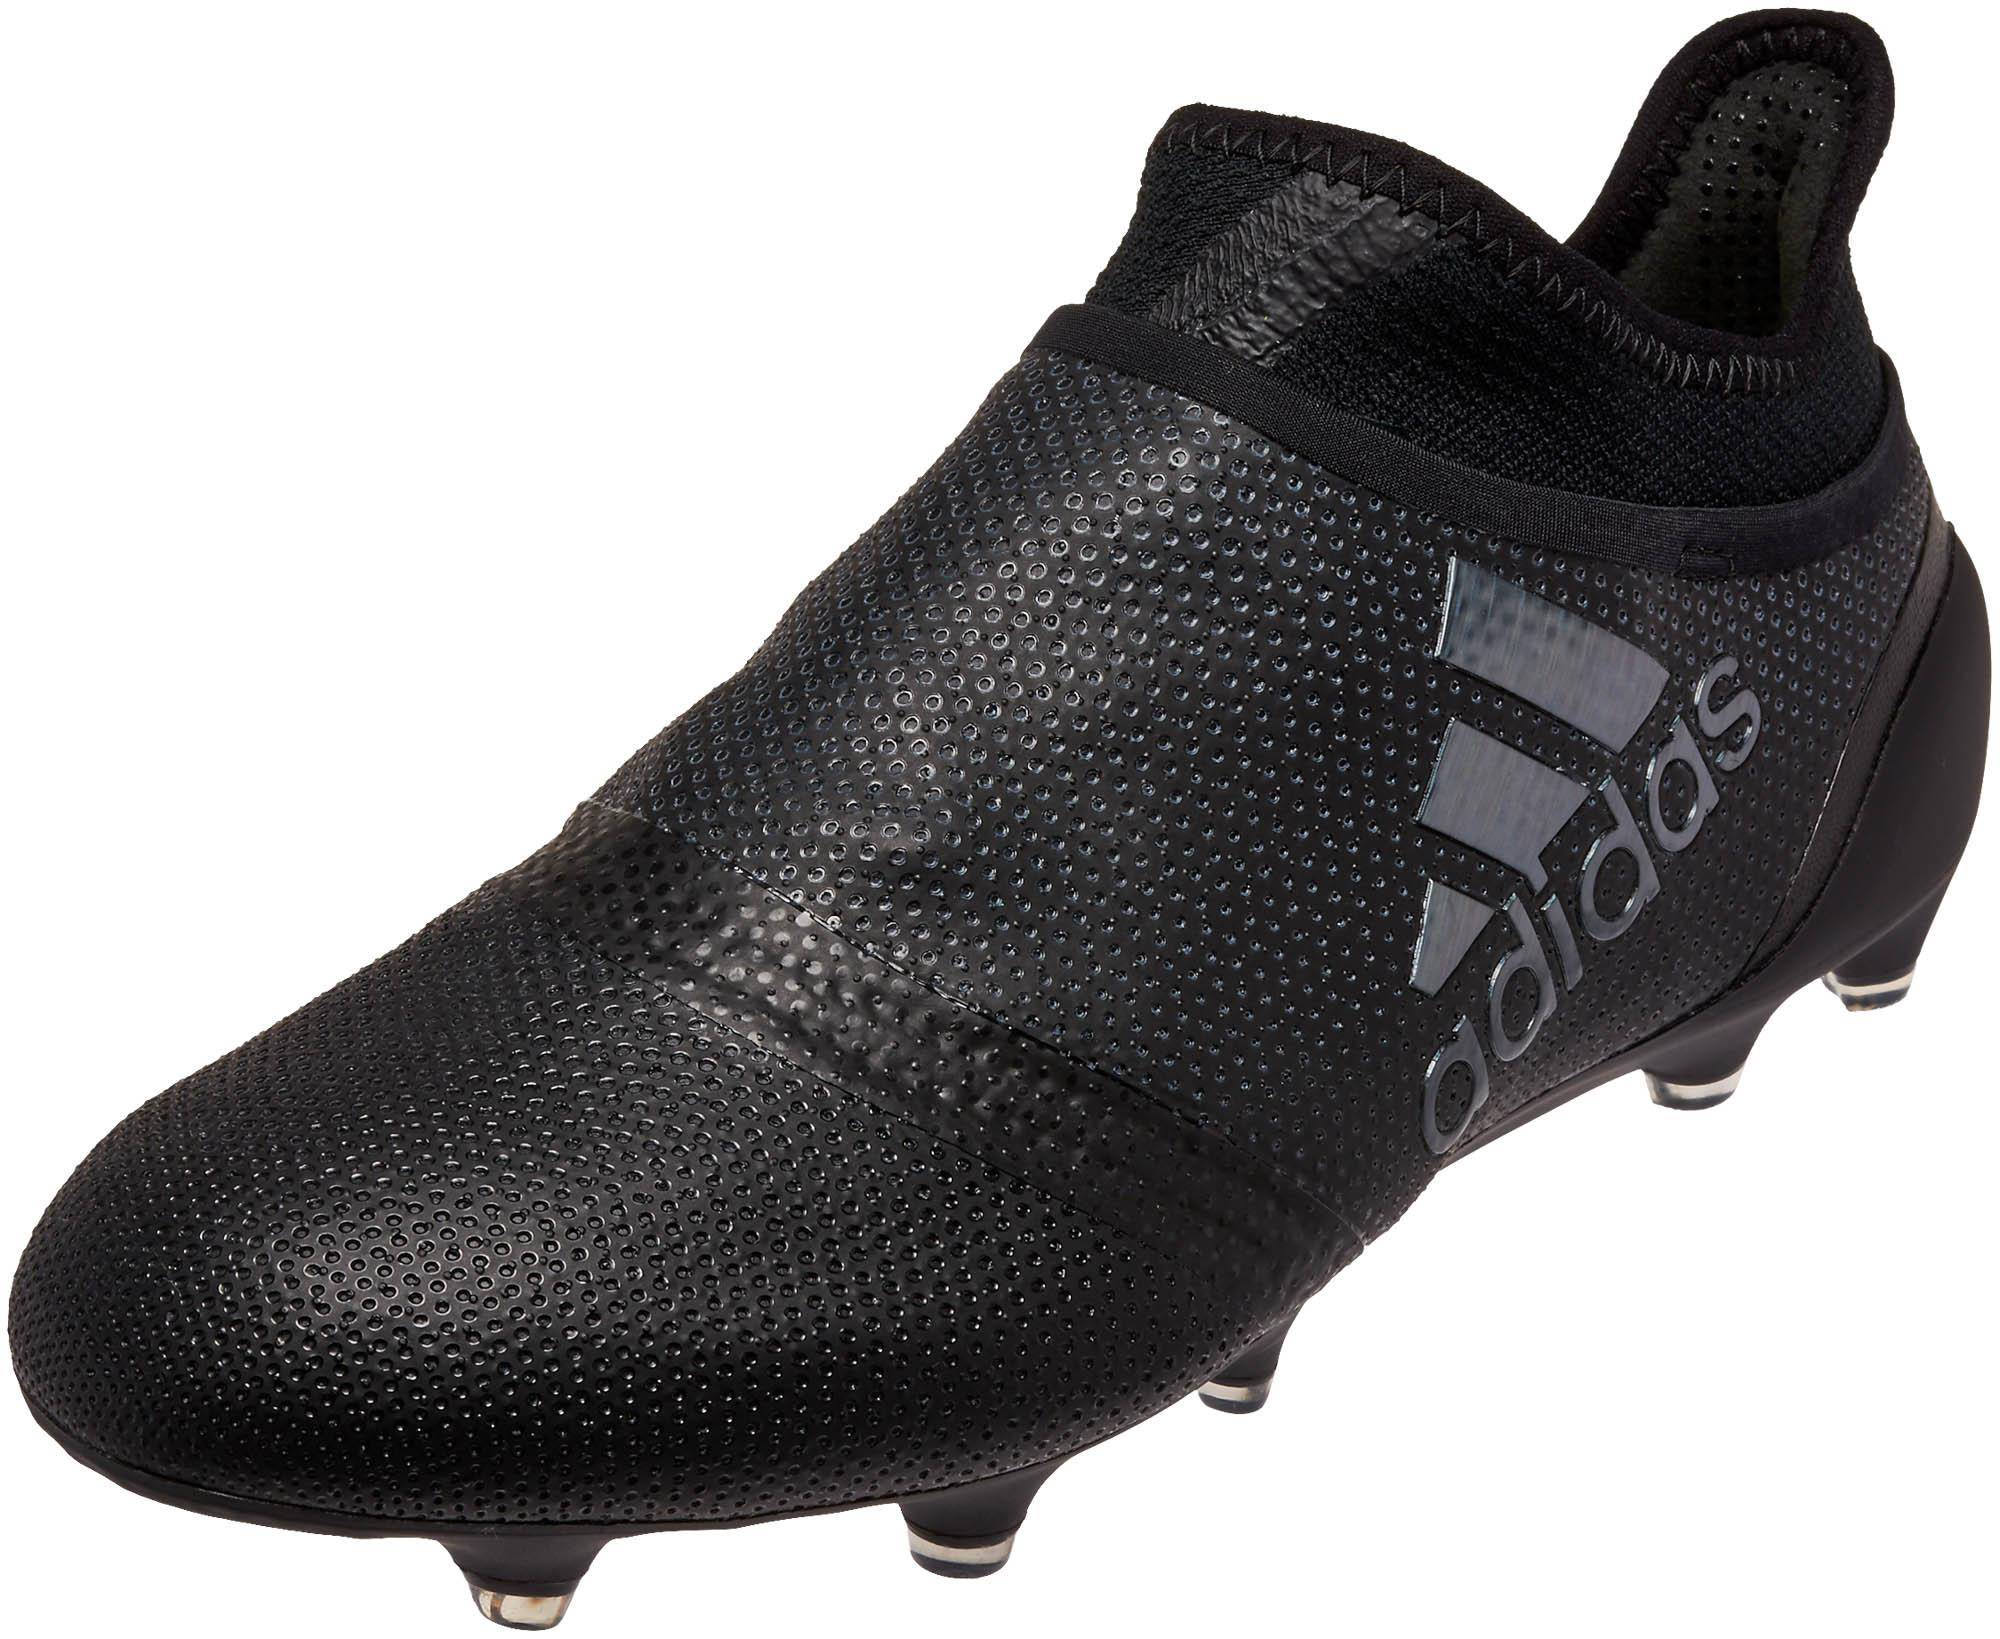 b5f67d437 adidas X 17+ Purechaos FG Soccer Cleats - Black - Soccer Master